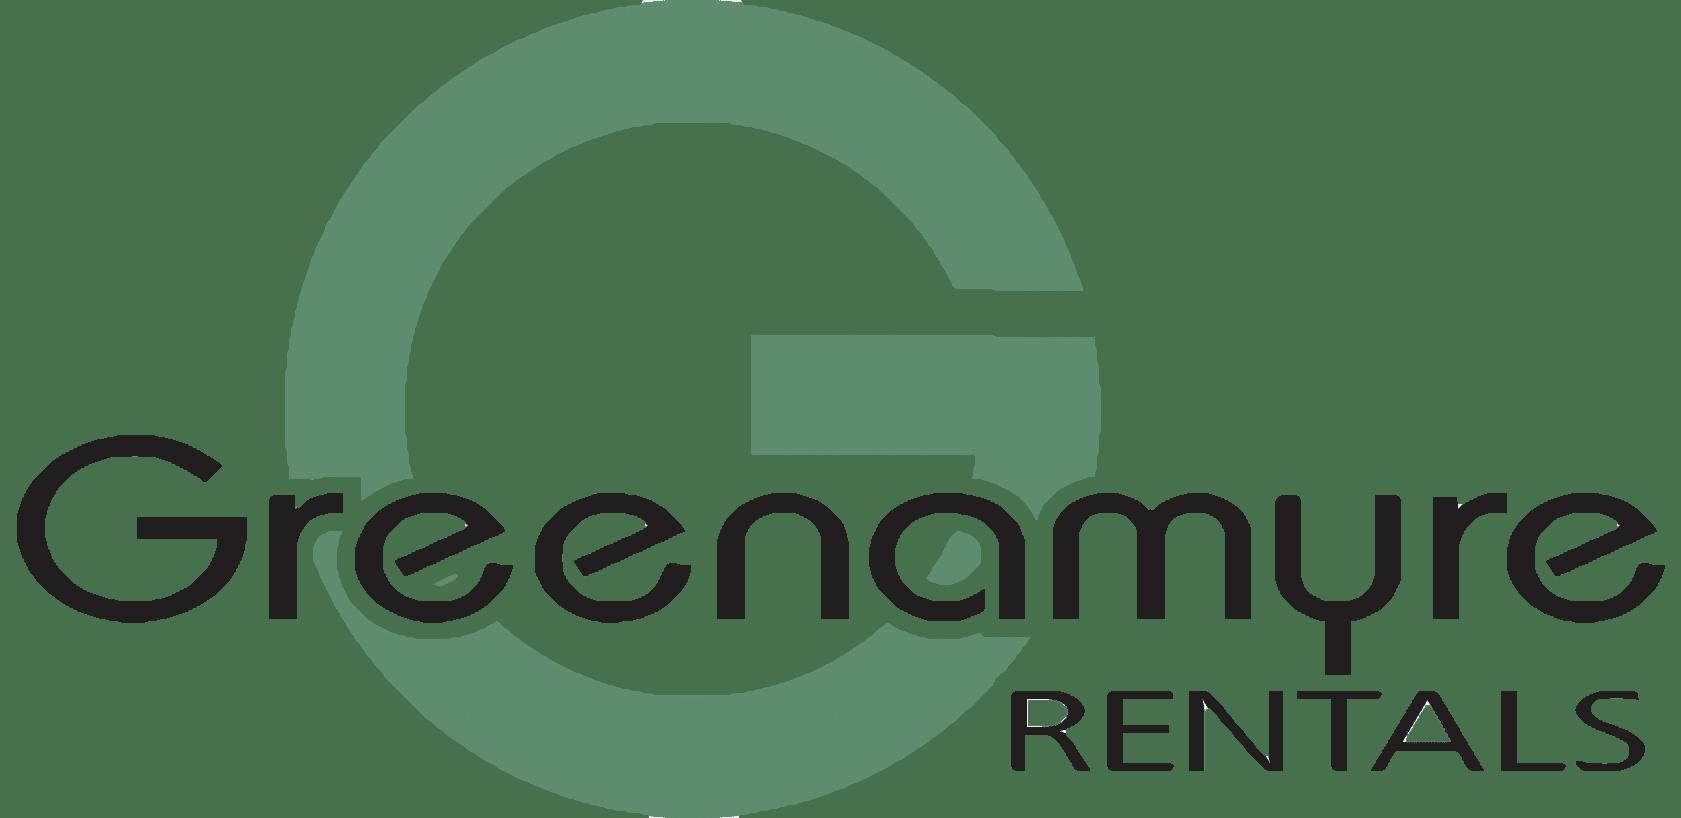 Greenamyre Rentals